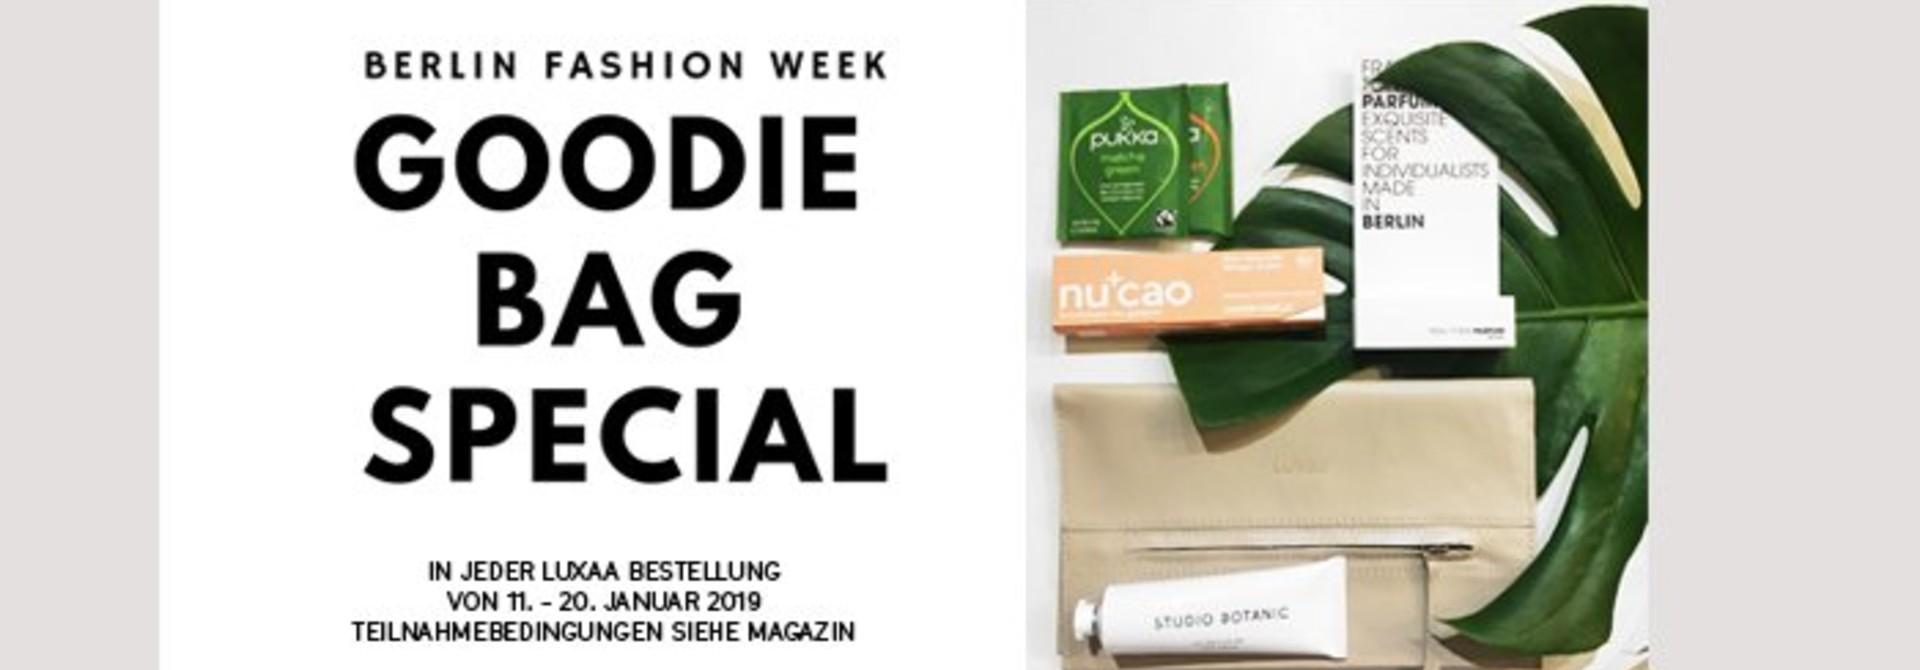 Berlin Fashion Week Special